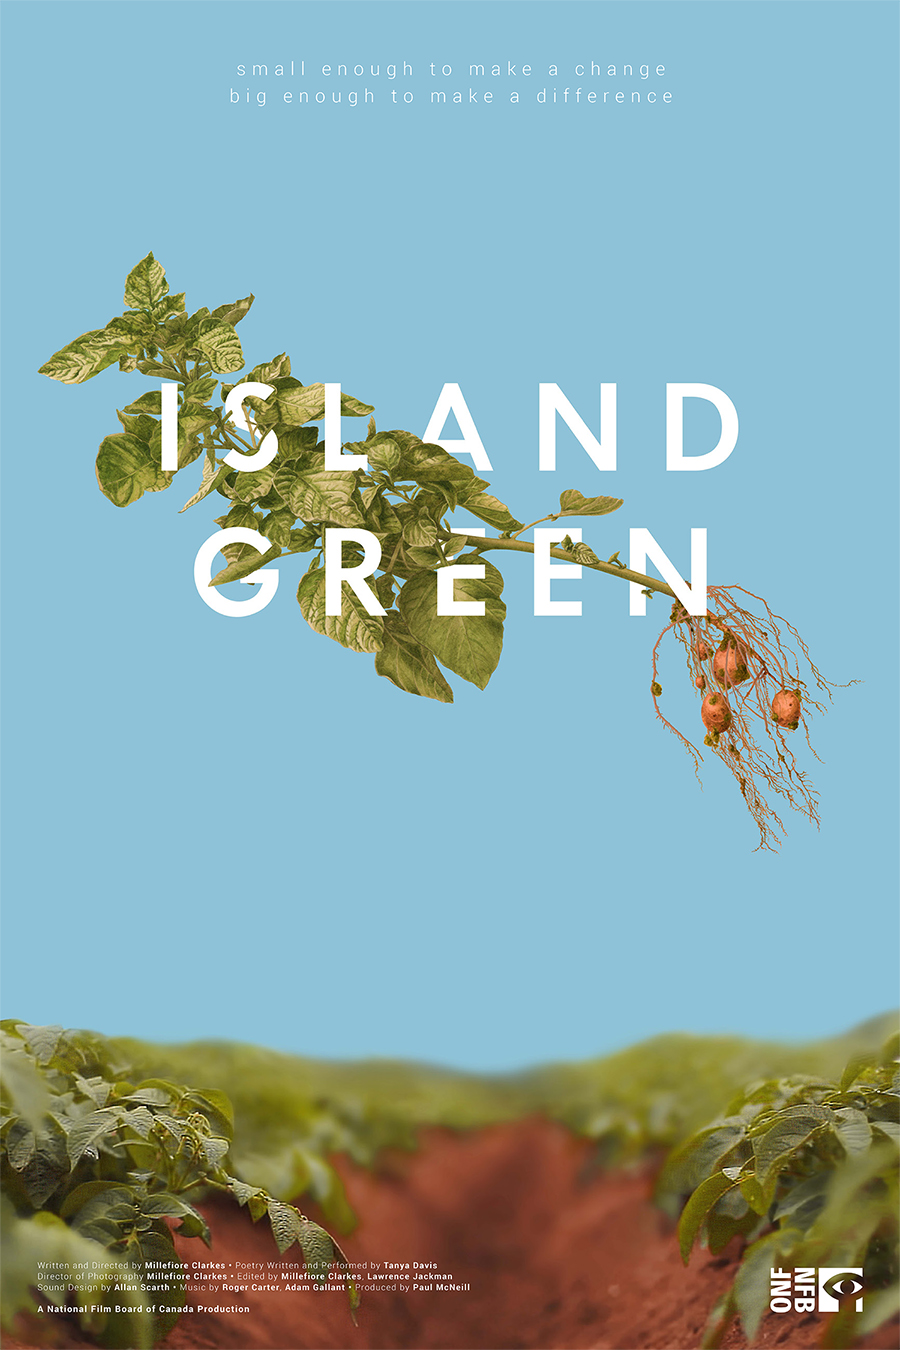 Island Green poster